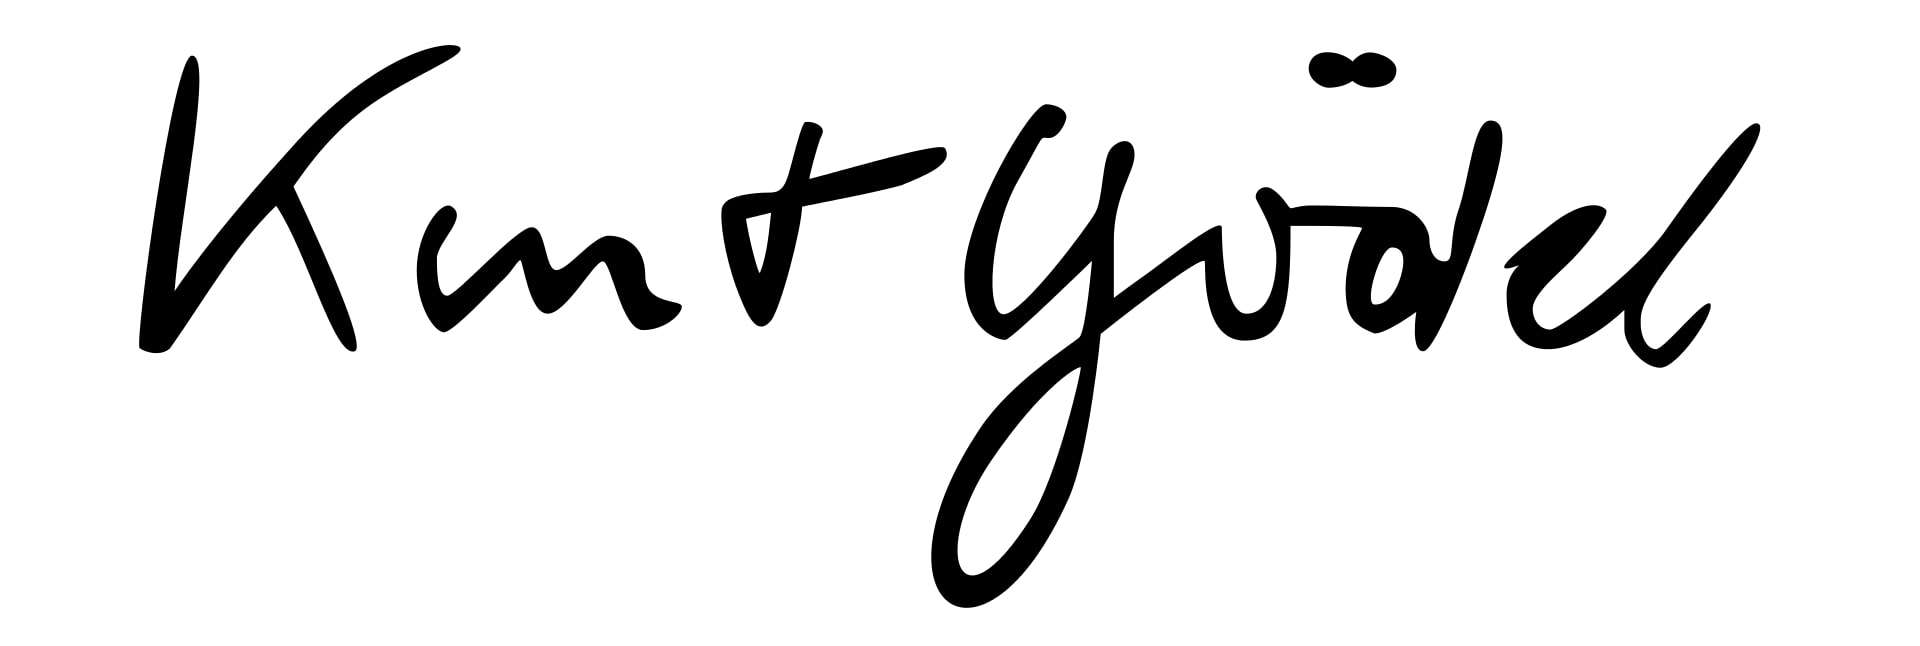 Kurt Gödel Signature